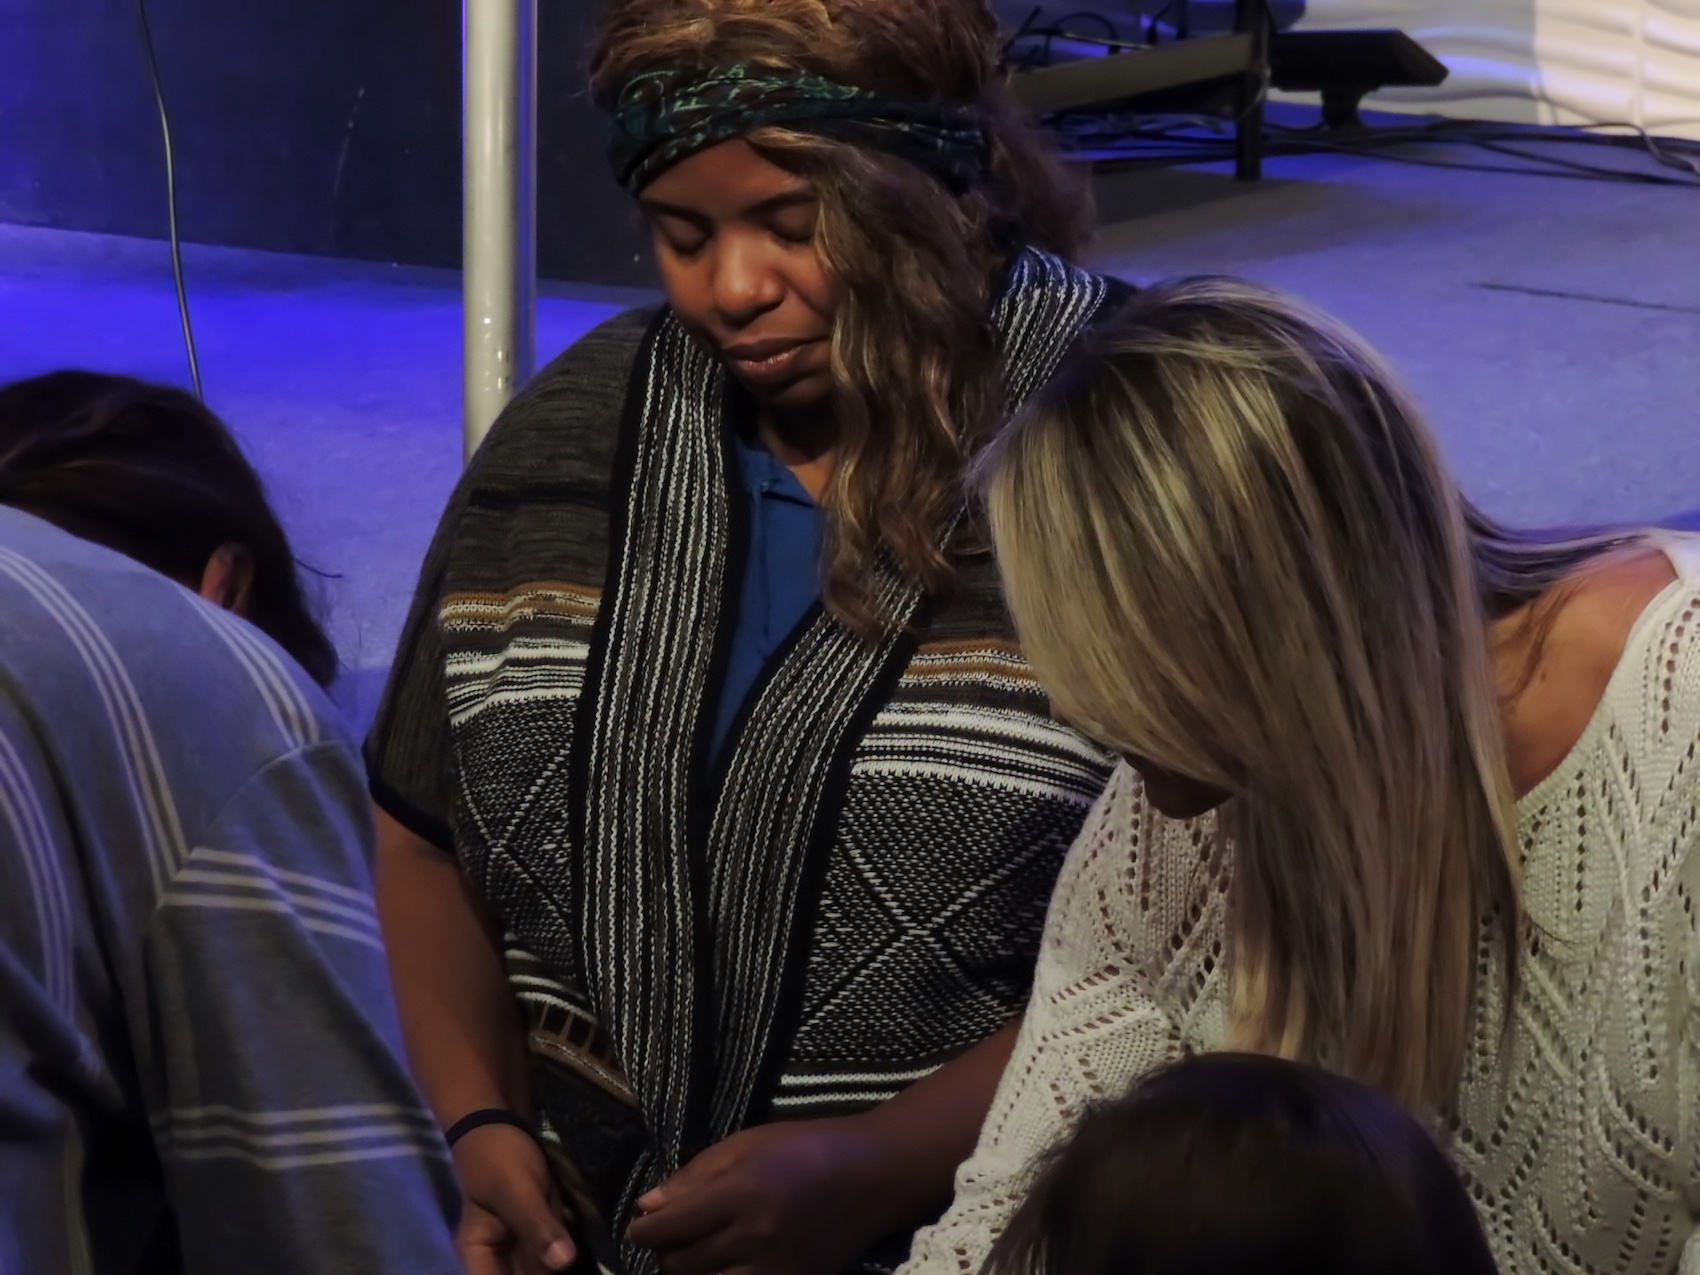 lady-healing-prayer